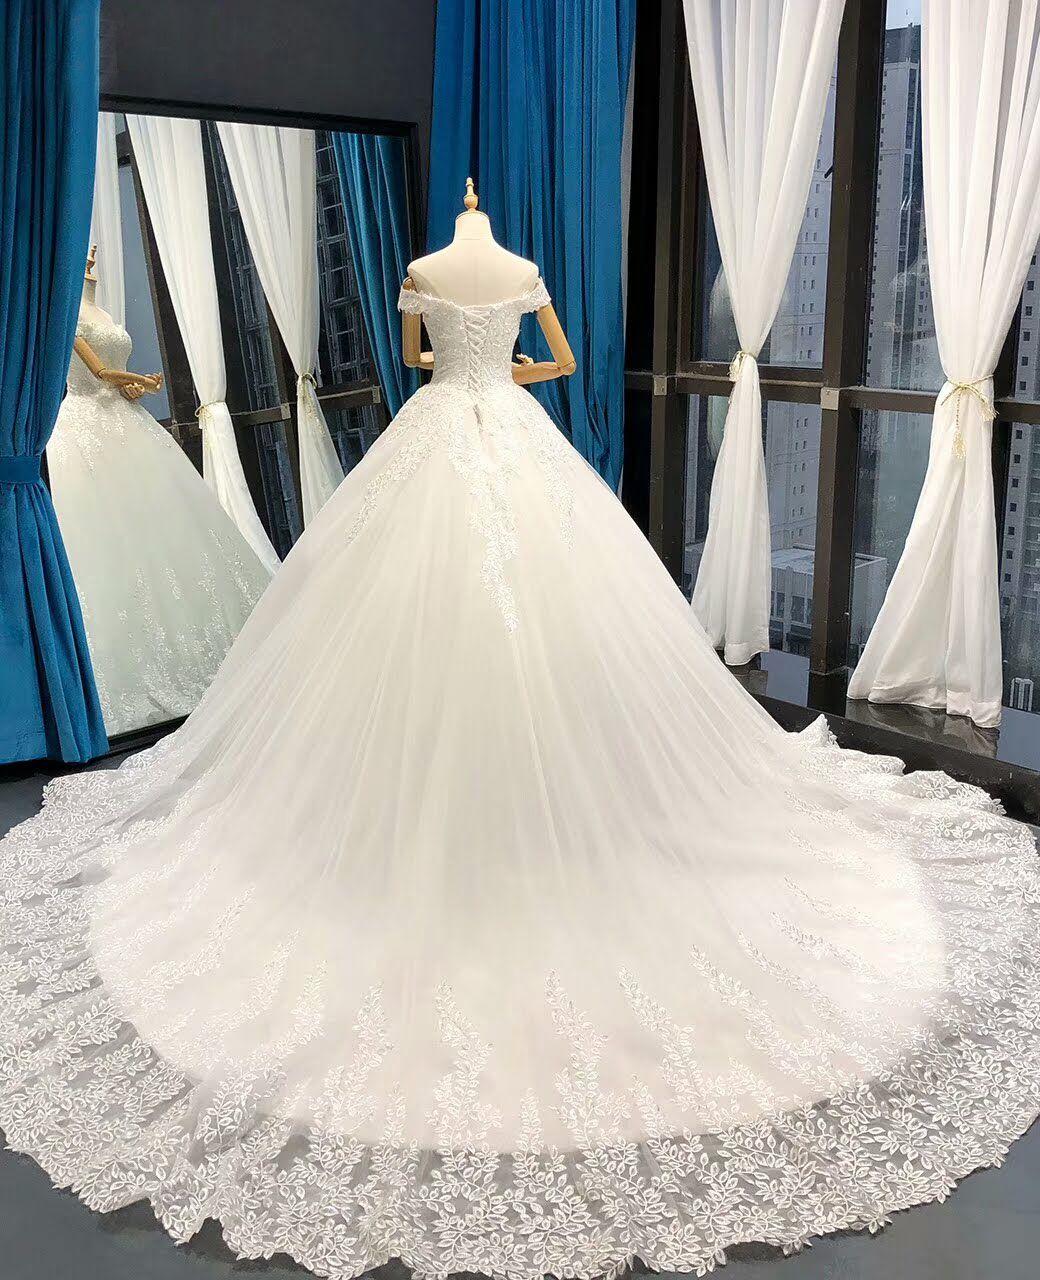 Xp Bridal Wedding Dress Wholesaller Instagram Xpbridal Id